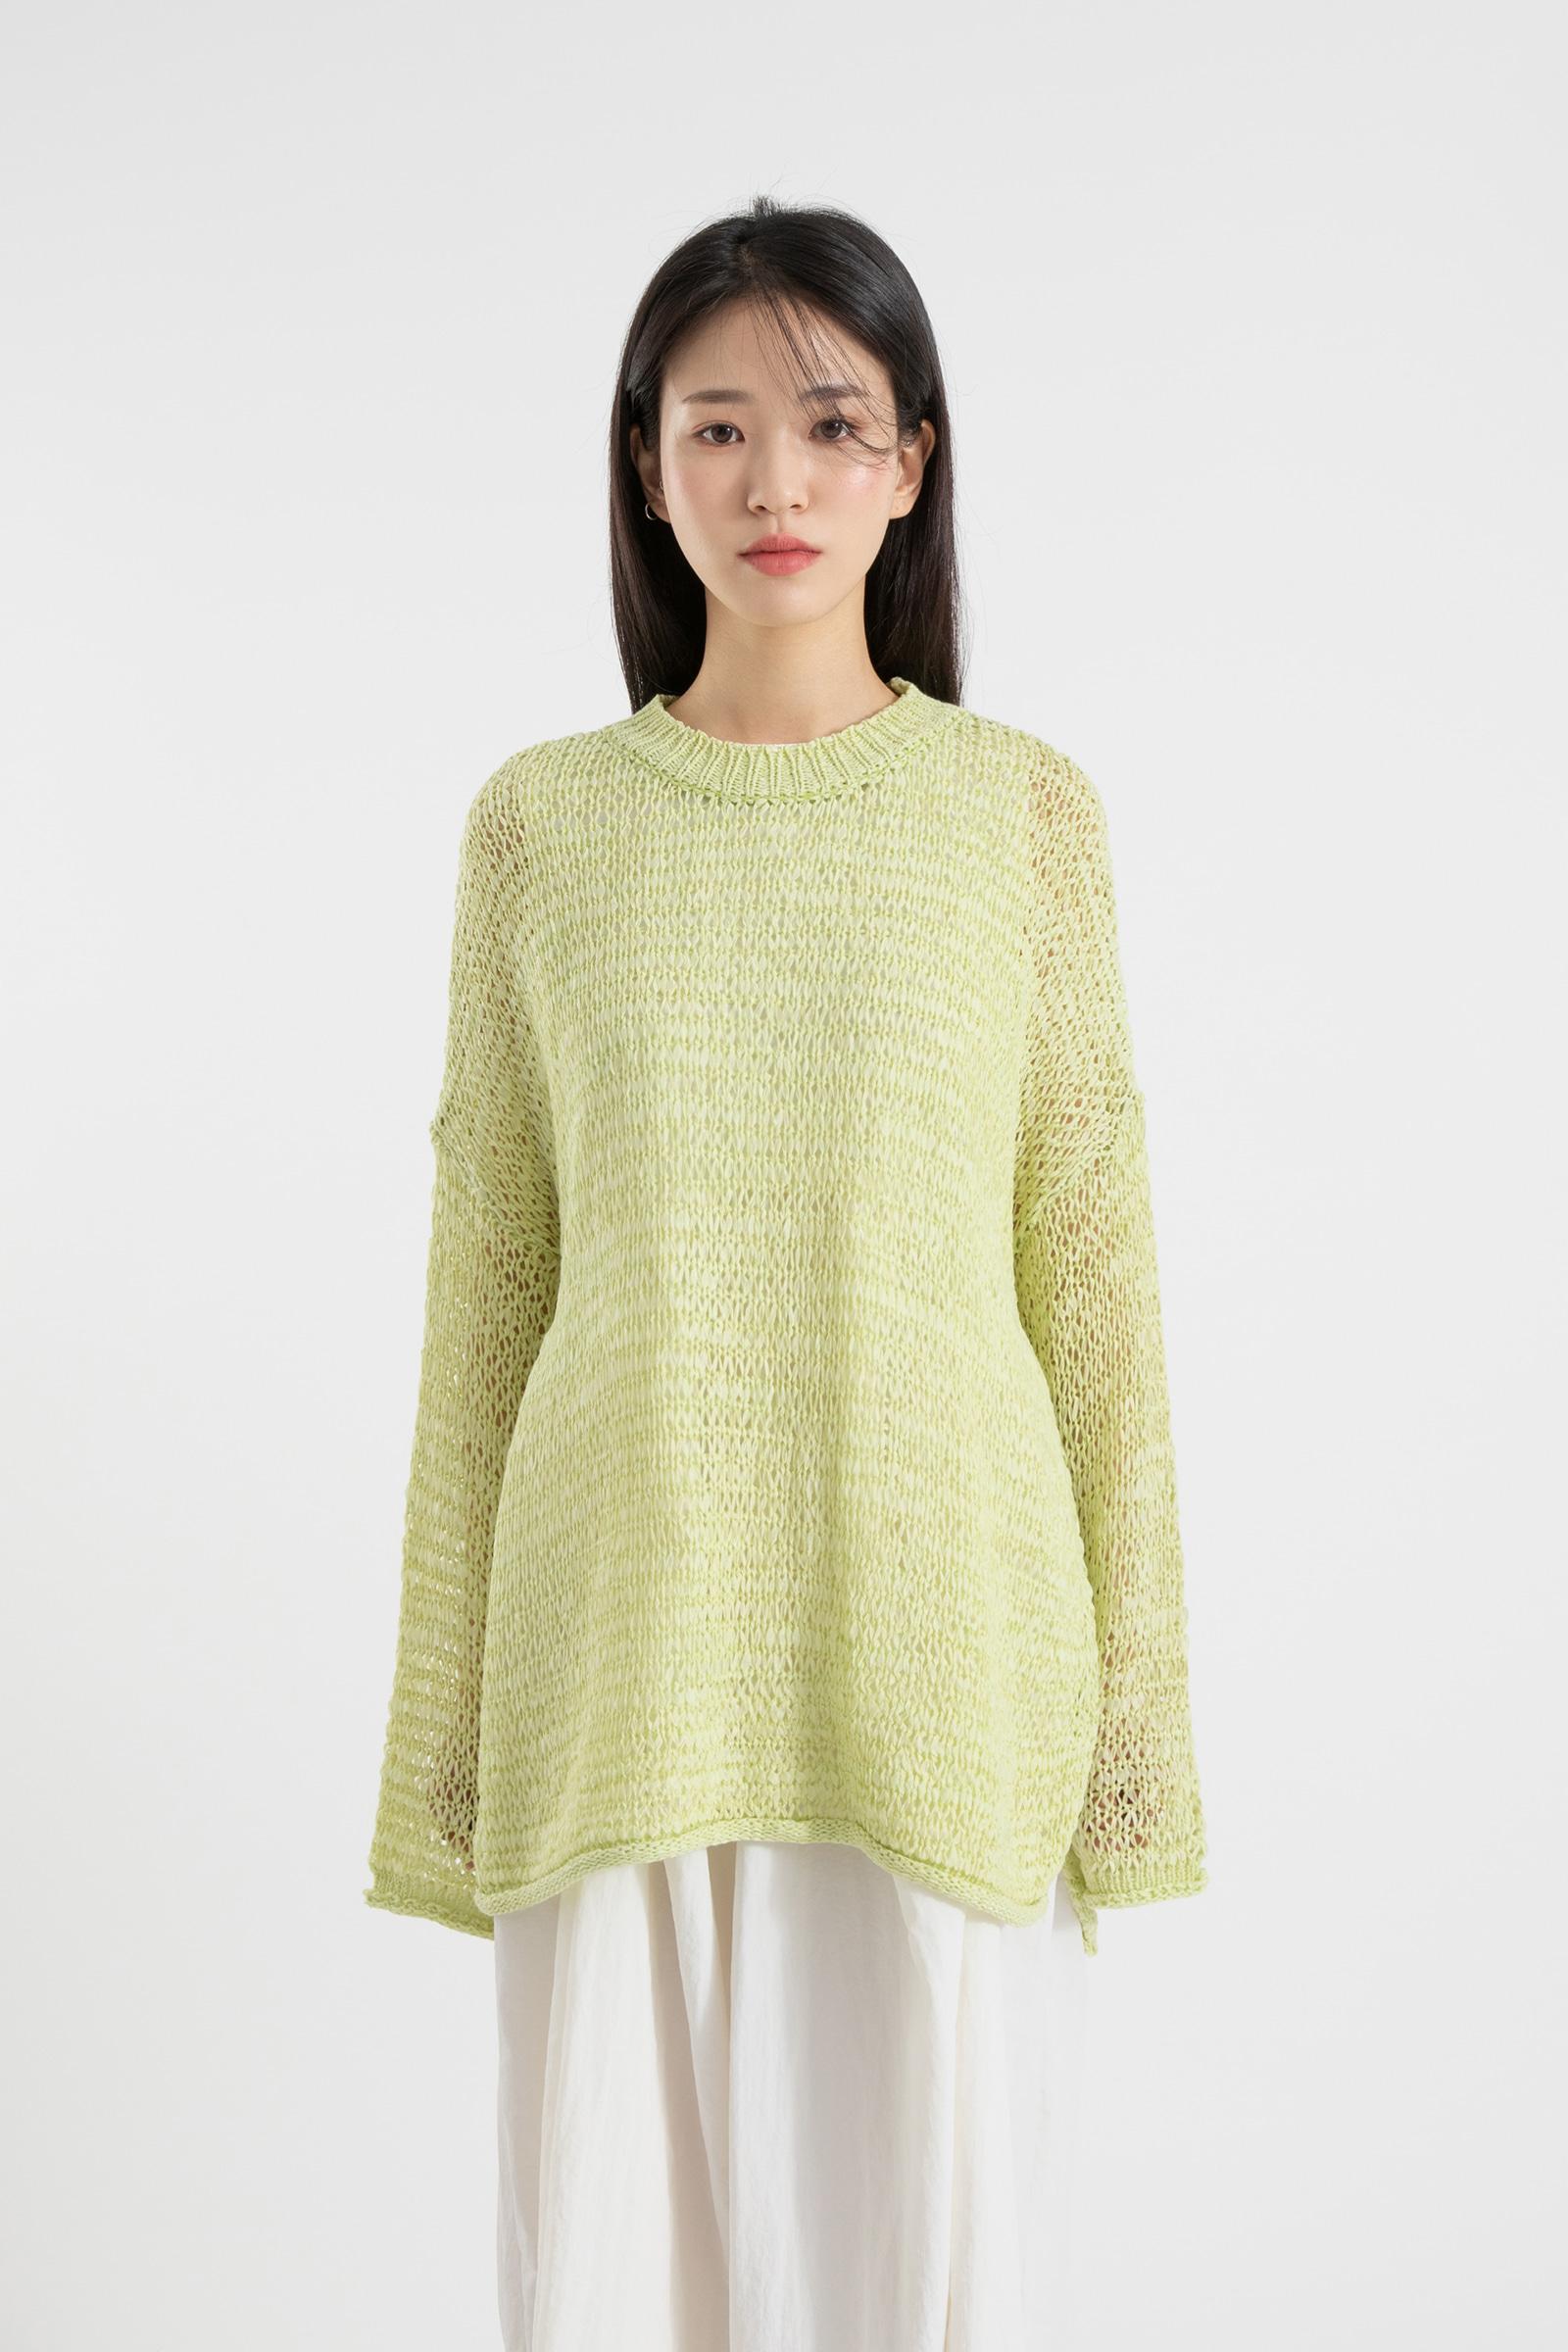 Palette over round neck knit